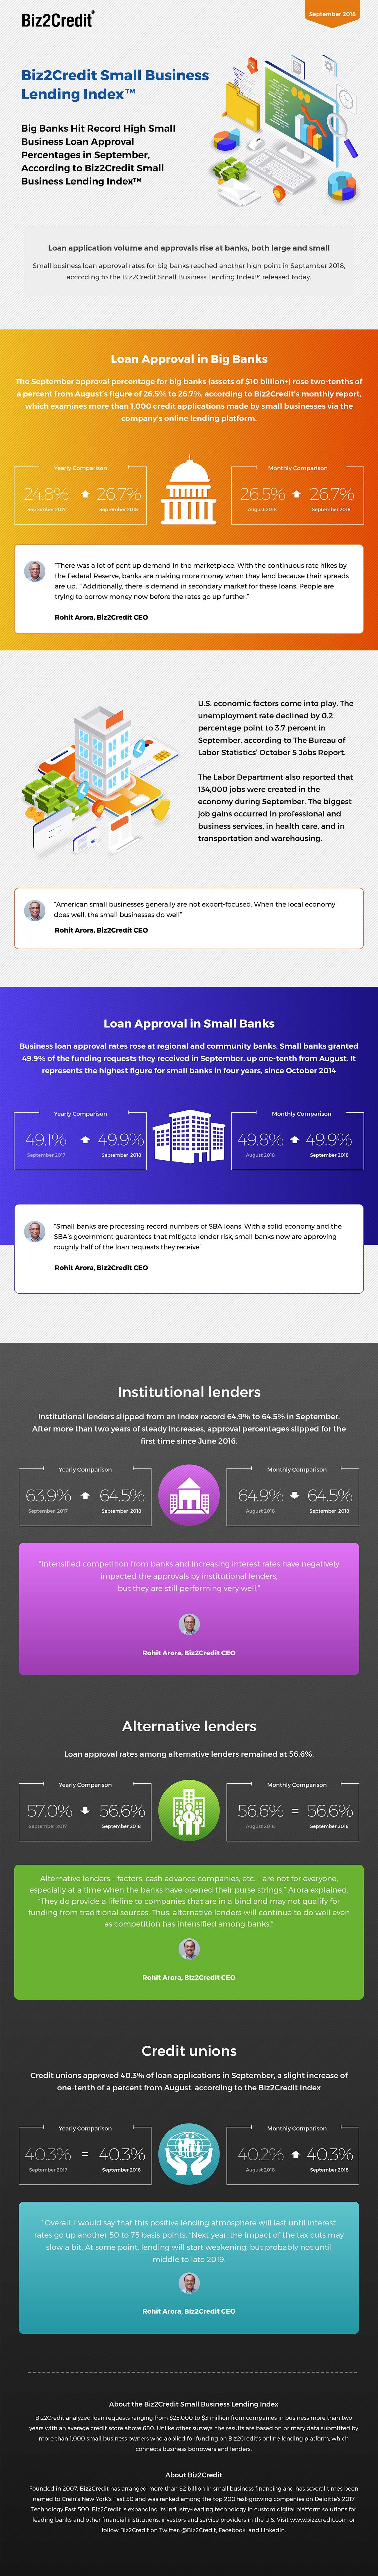 september18 Lending Index Infographic